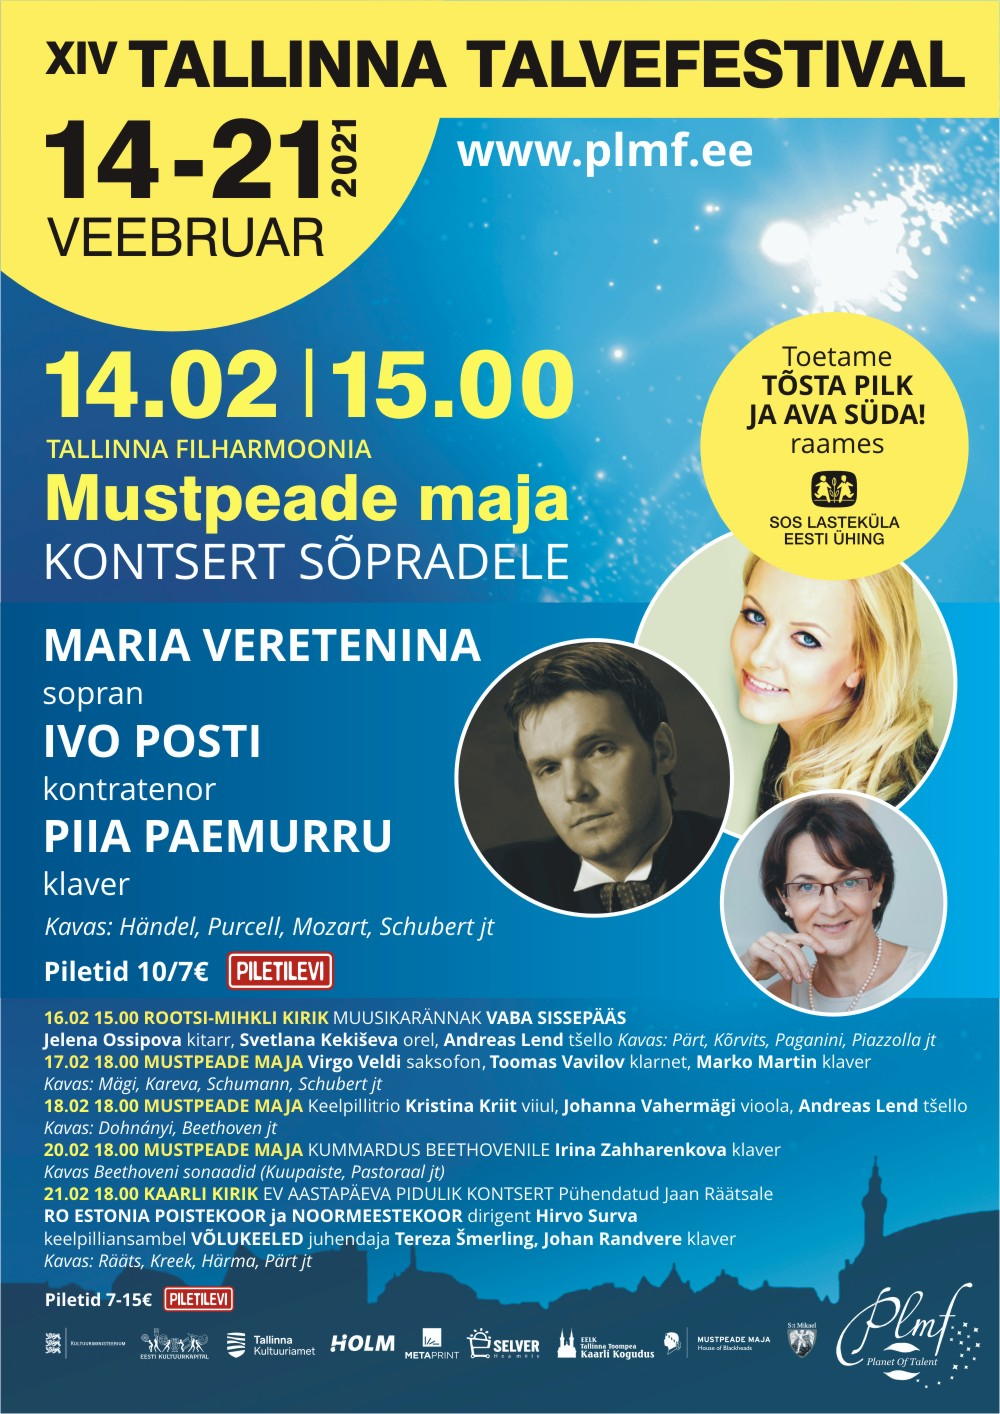 Maria Veretenina, Ivo Posti, Piia Paemurru - XIV Tallinna Talvefestival